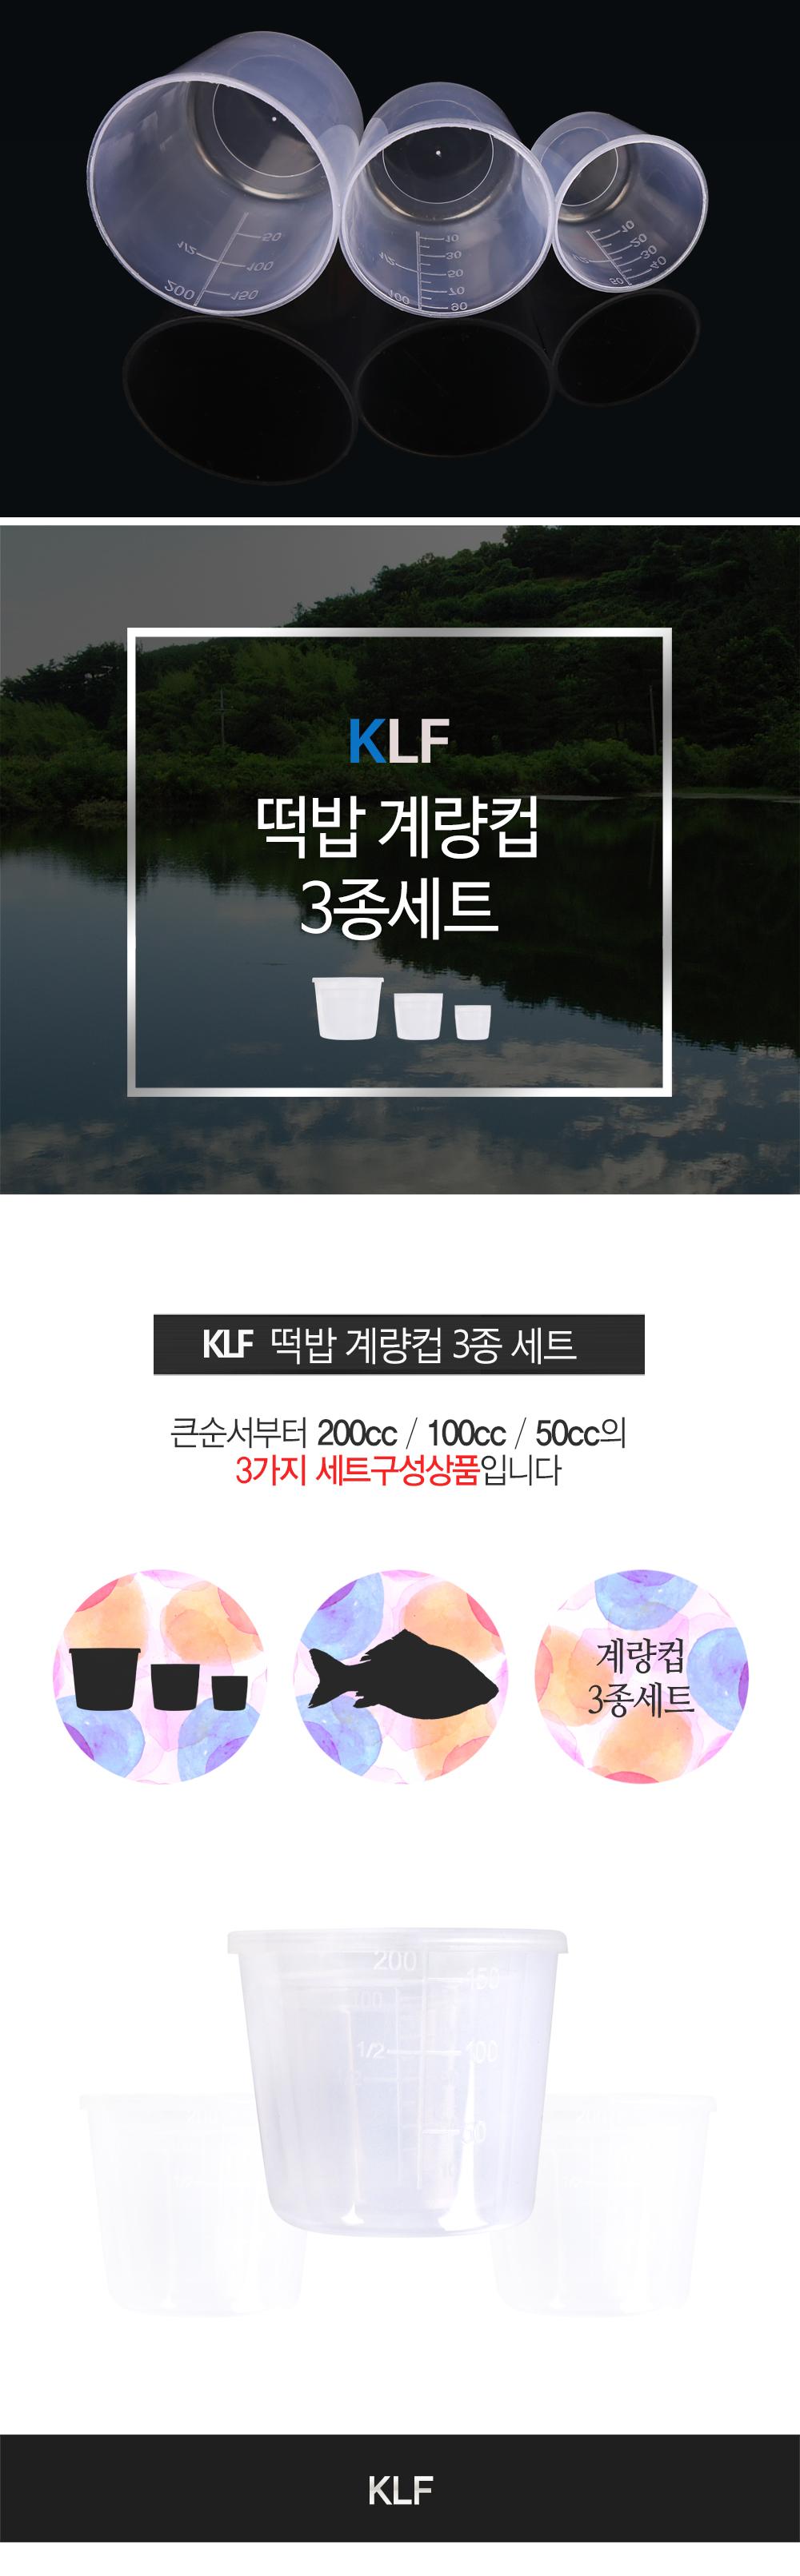 KLF 떡밥 계량컵 3종 세트 계량컵 떡밥계량컵 컵 떡밥측정컵